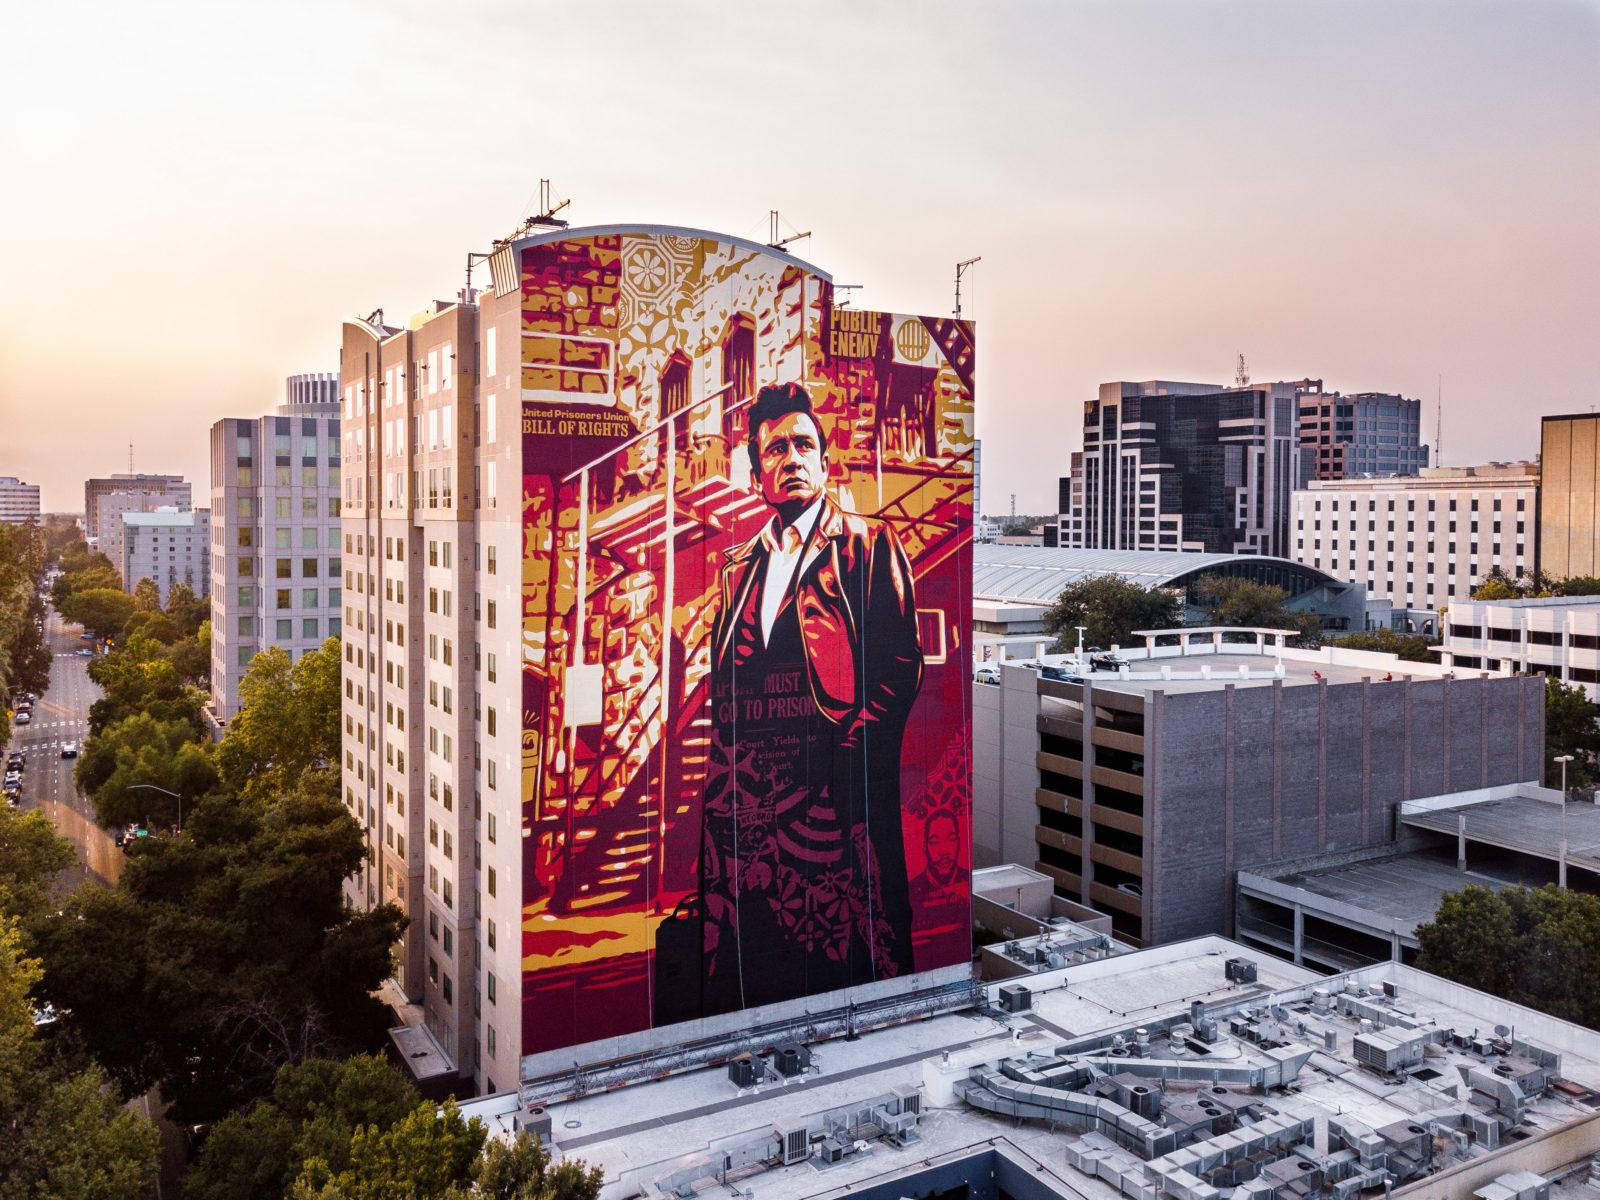 street art wide open walls sacramento californie USA festival mural johnny cashShepard Fairey  MERO radar - Les 10 murales les plus marquantes du festival Wide Open Walls Sacramento